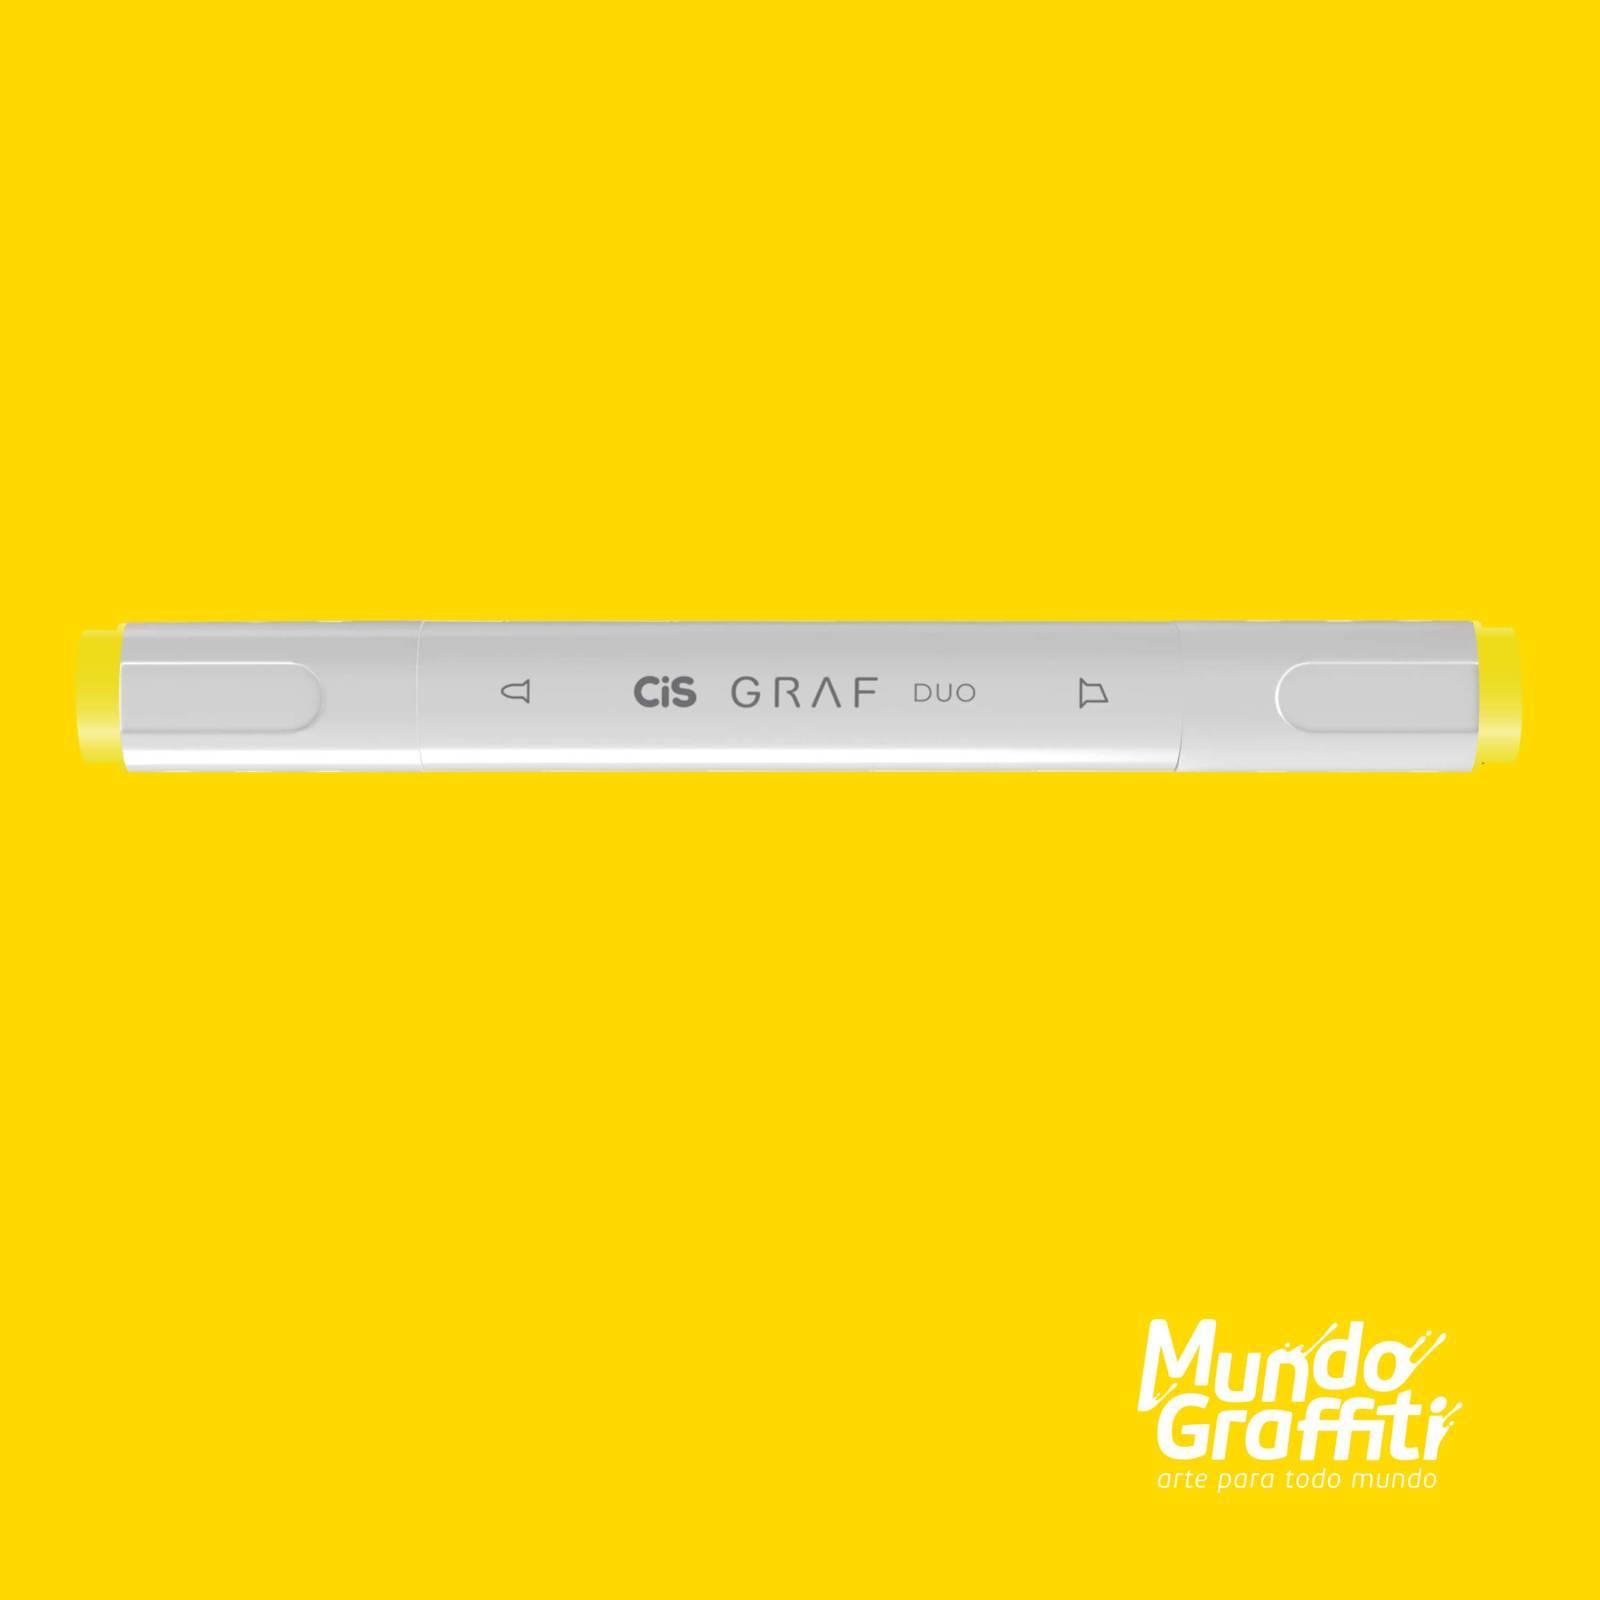 Marcador Cis Graf Duo Lemon Yellow 35 - Mundo Graffiti